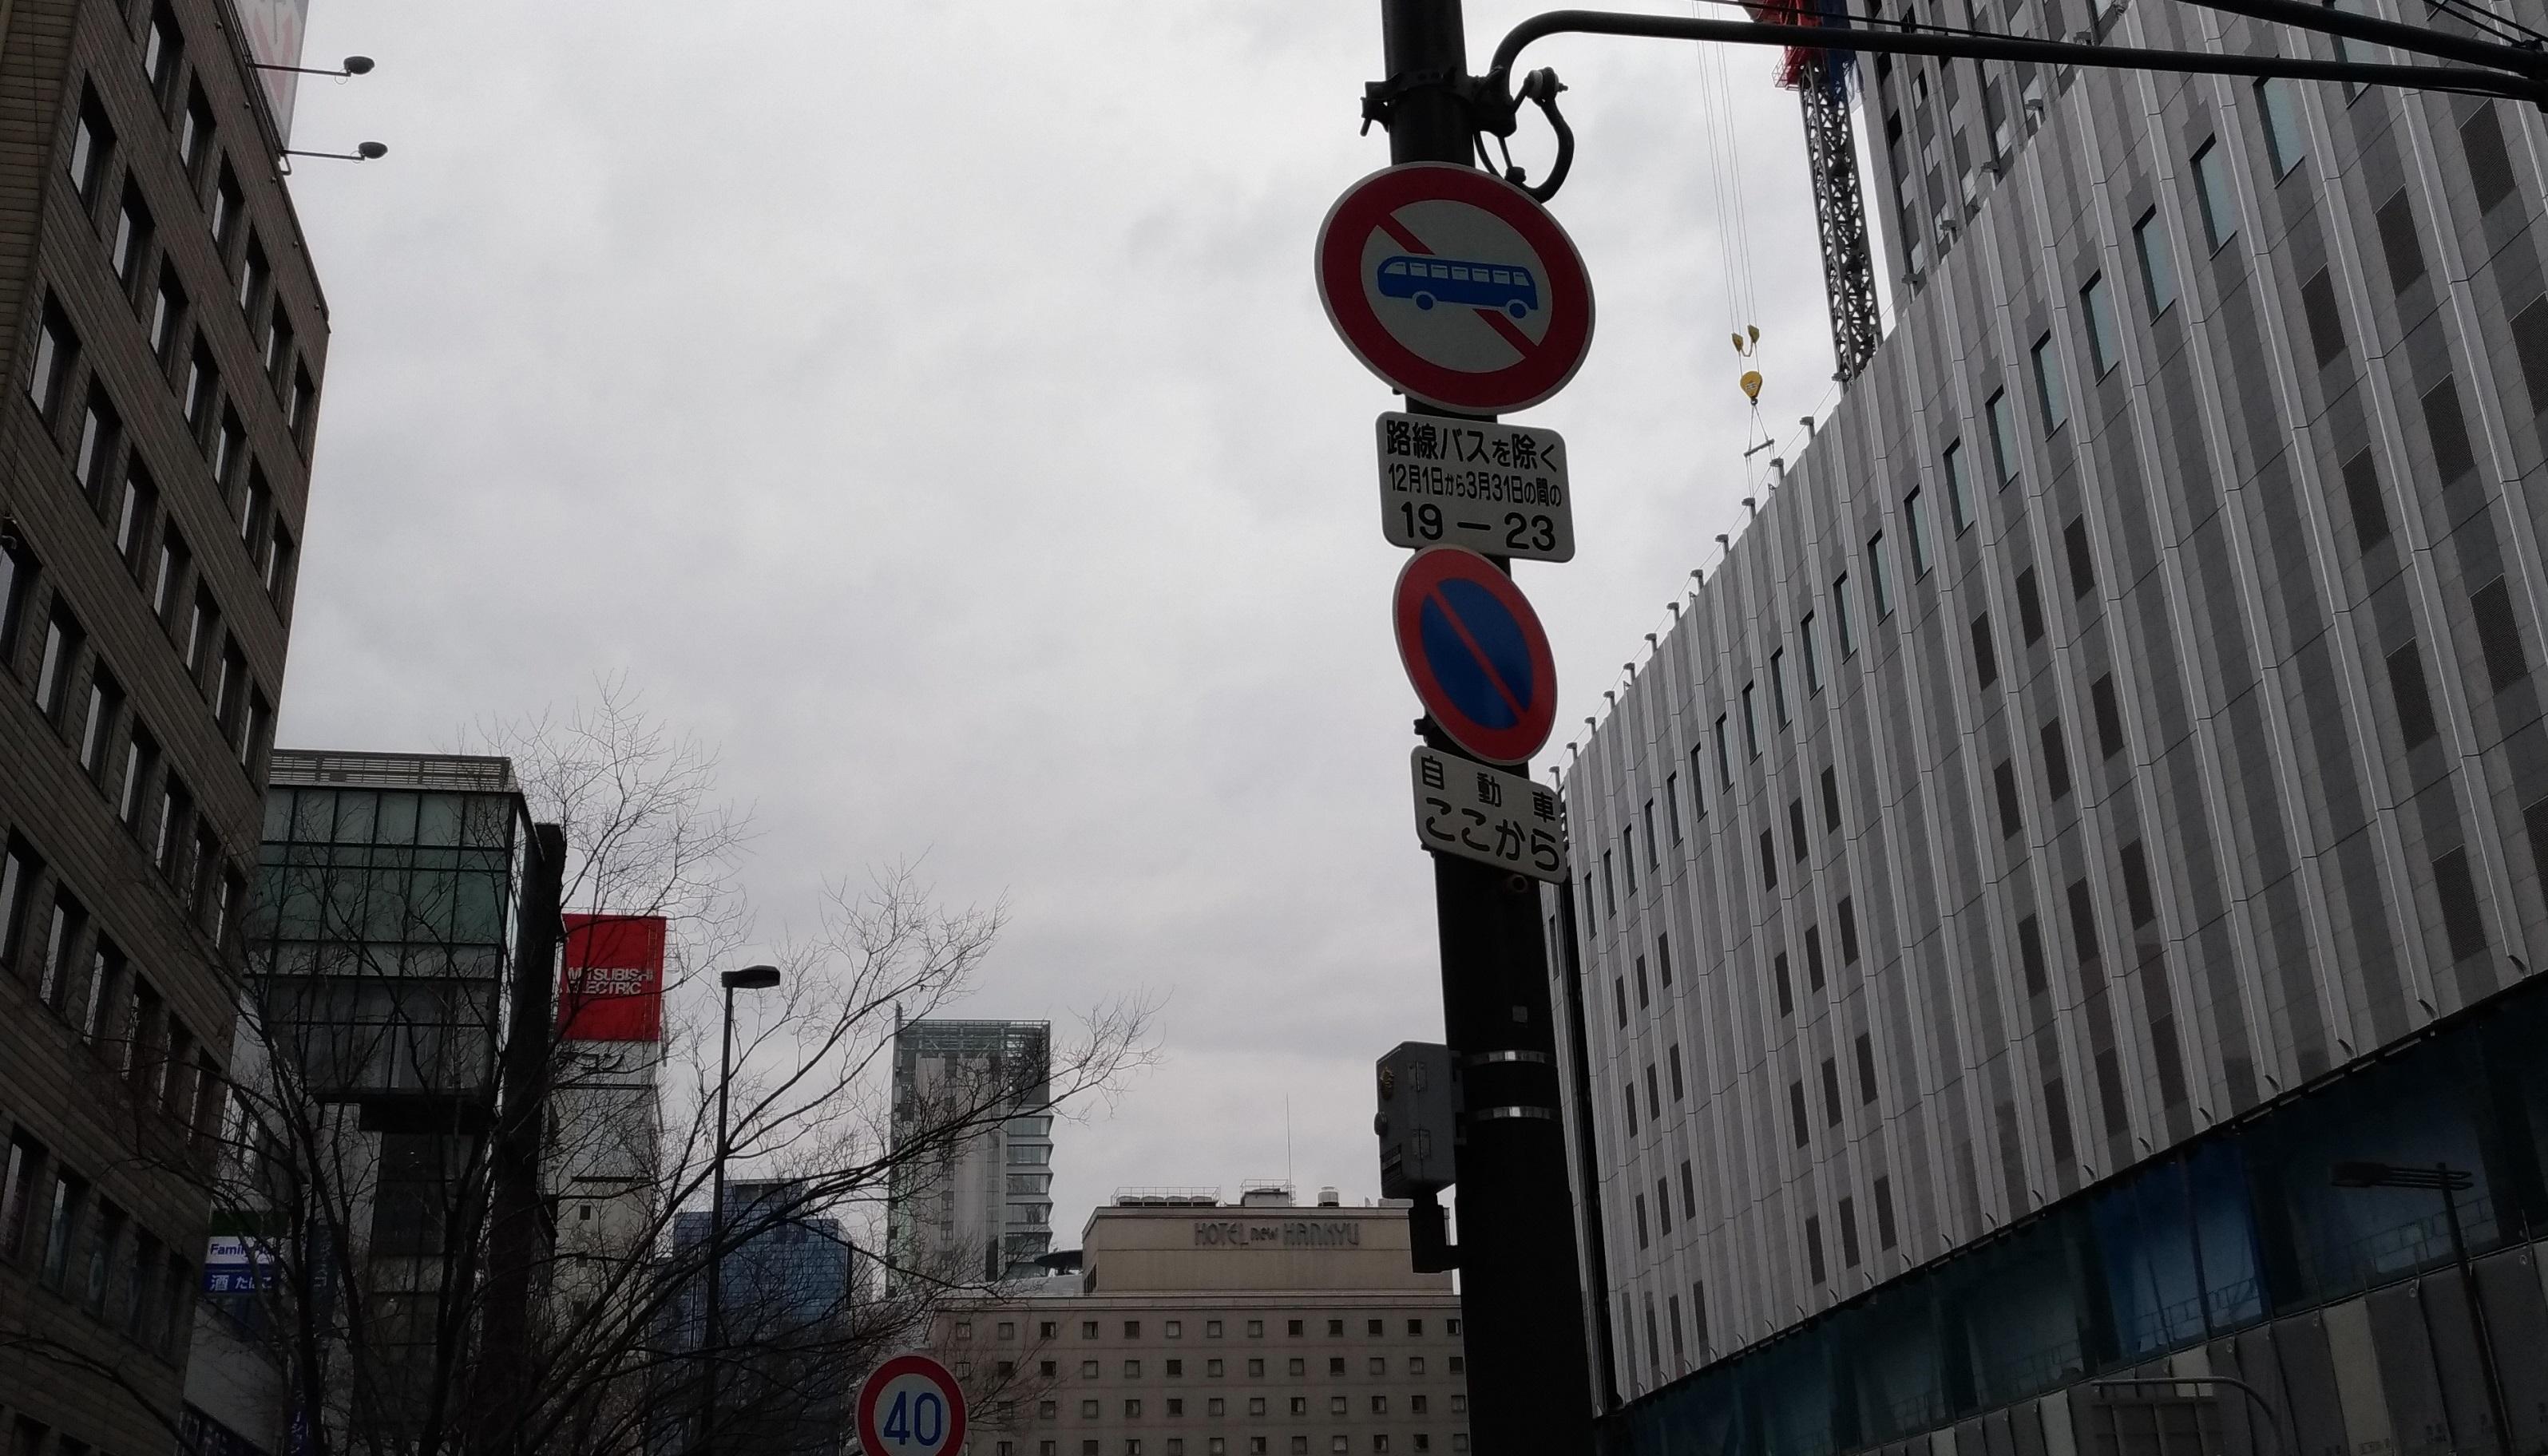 yodobashi_umeda_osaka_kenchiku2.jpg